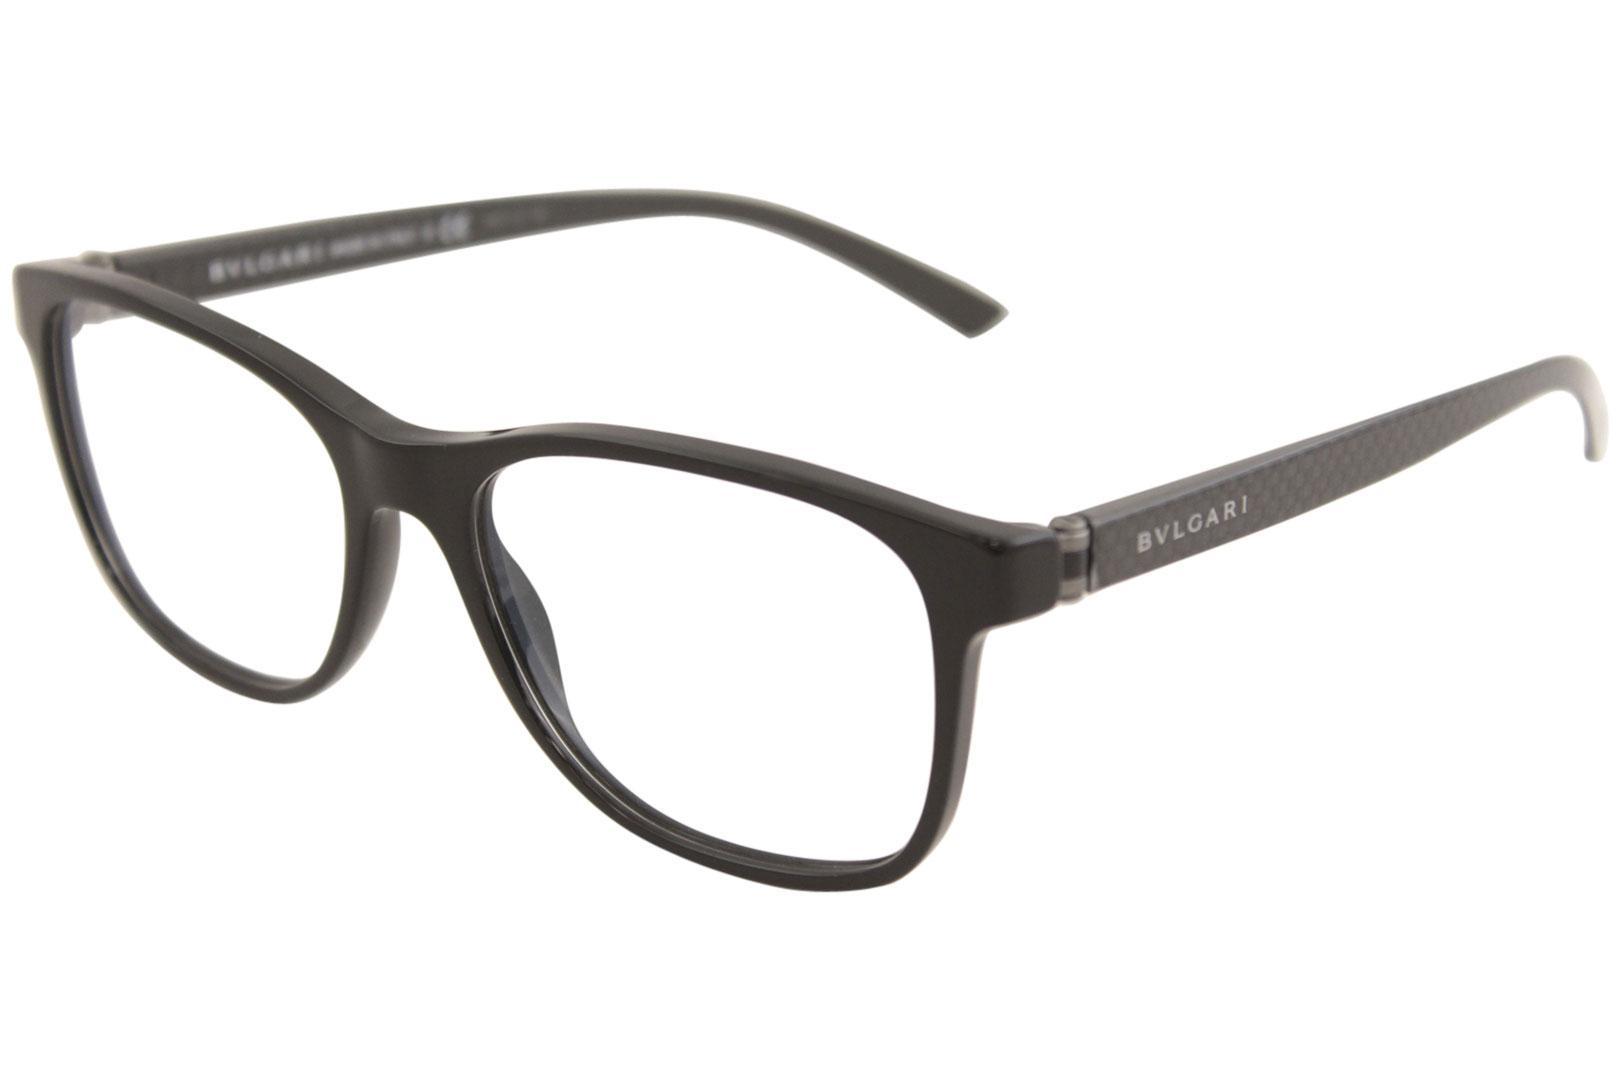 3724dccc3c Bvlgari Men s Eyeglasses BV3036 BV 3036 Full Rim Optical Frame by Bvlgari